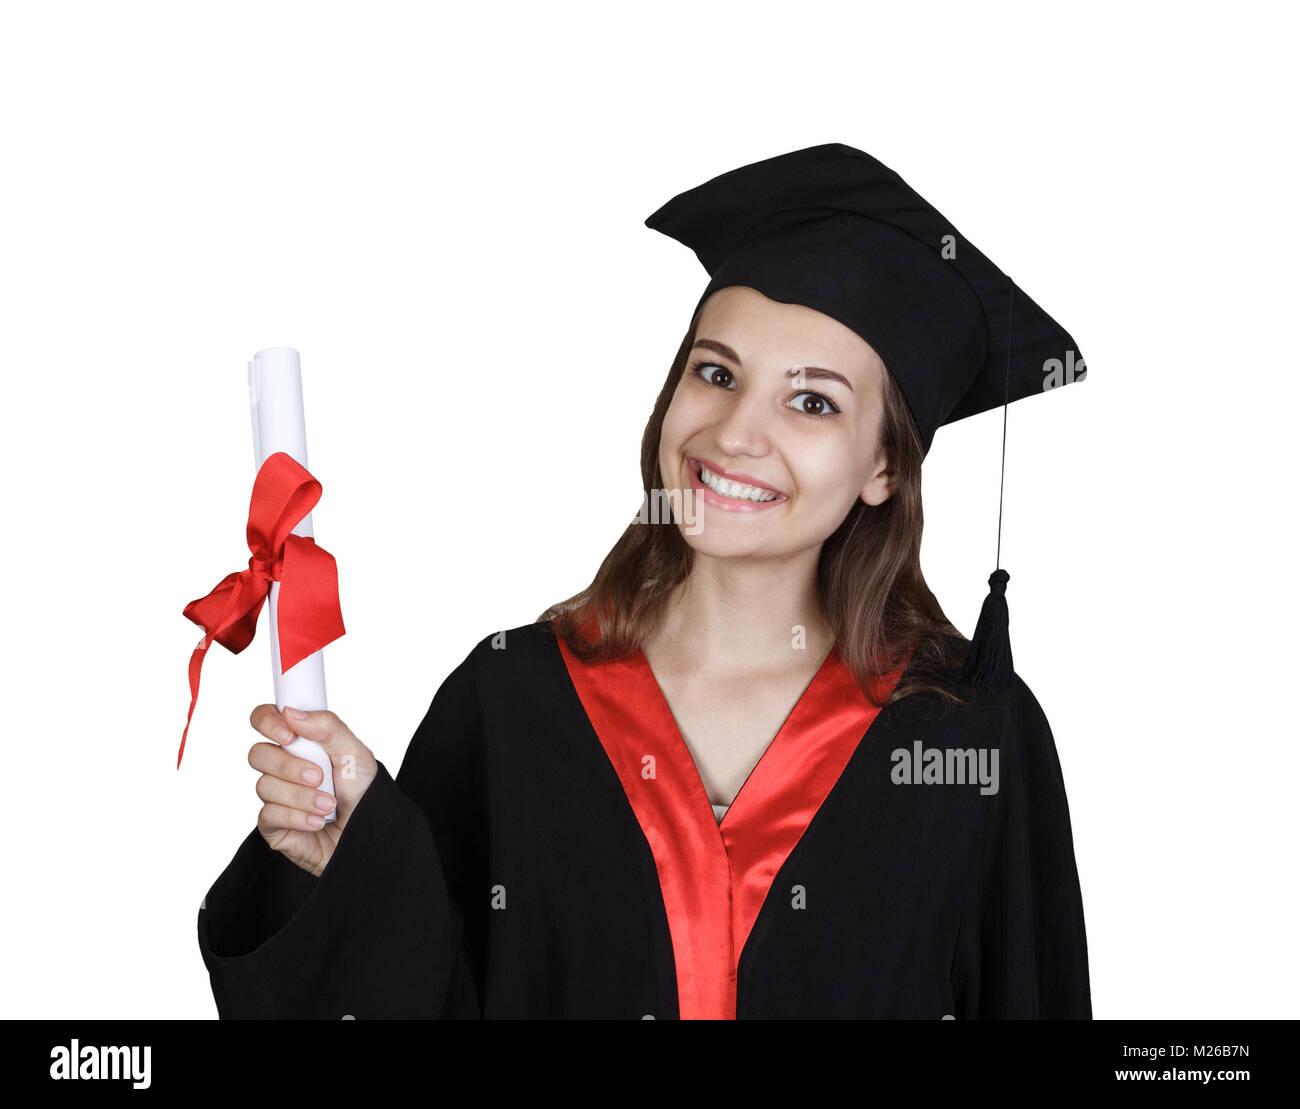 314bca7b8c Graduation Gown Stock Photos   Graduation Gown Stock Images - Alamy